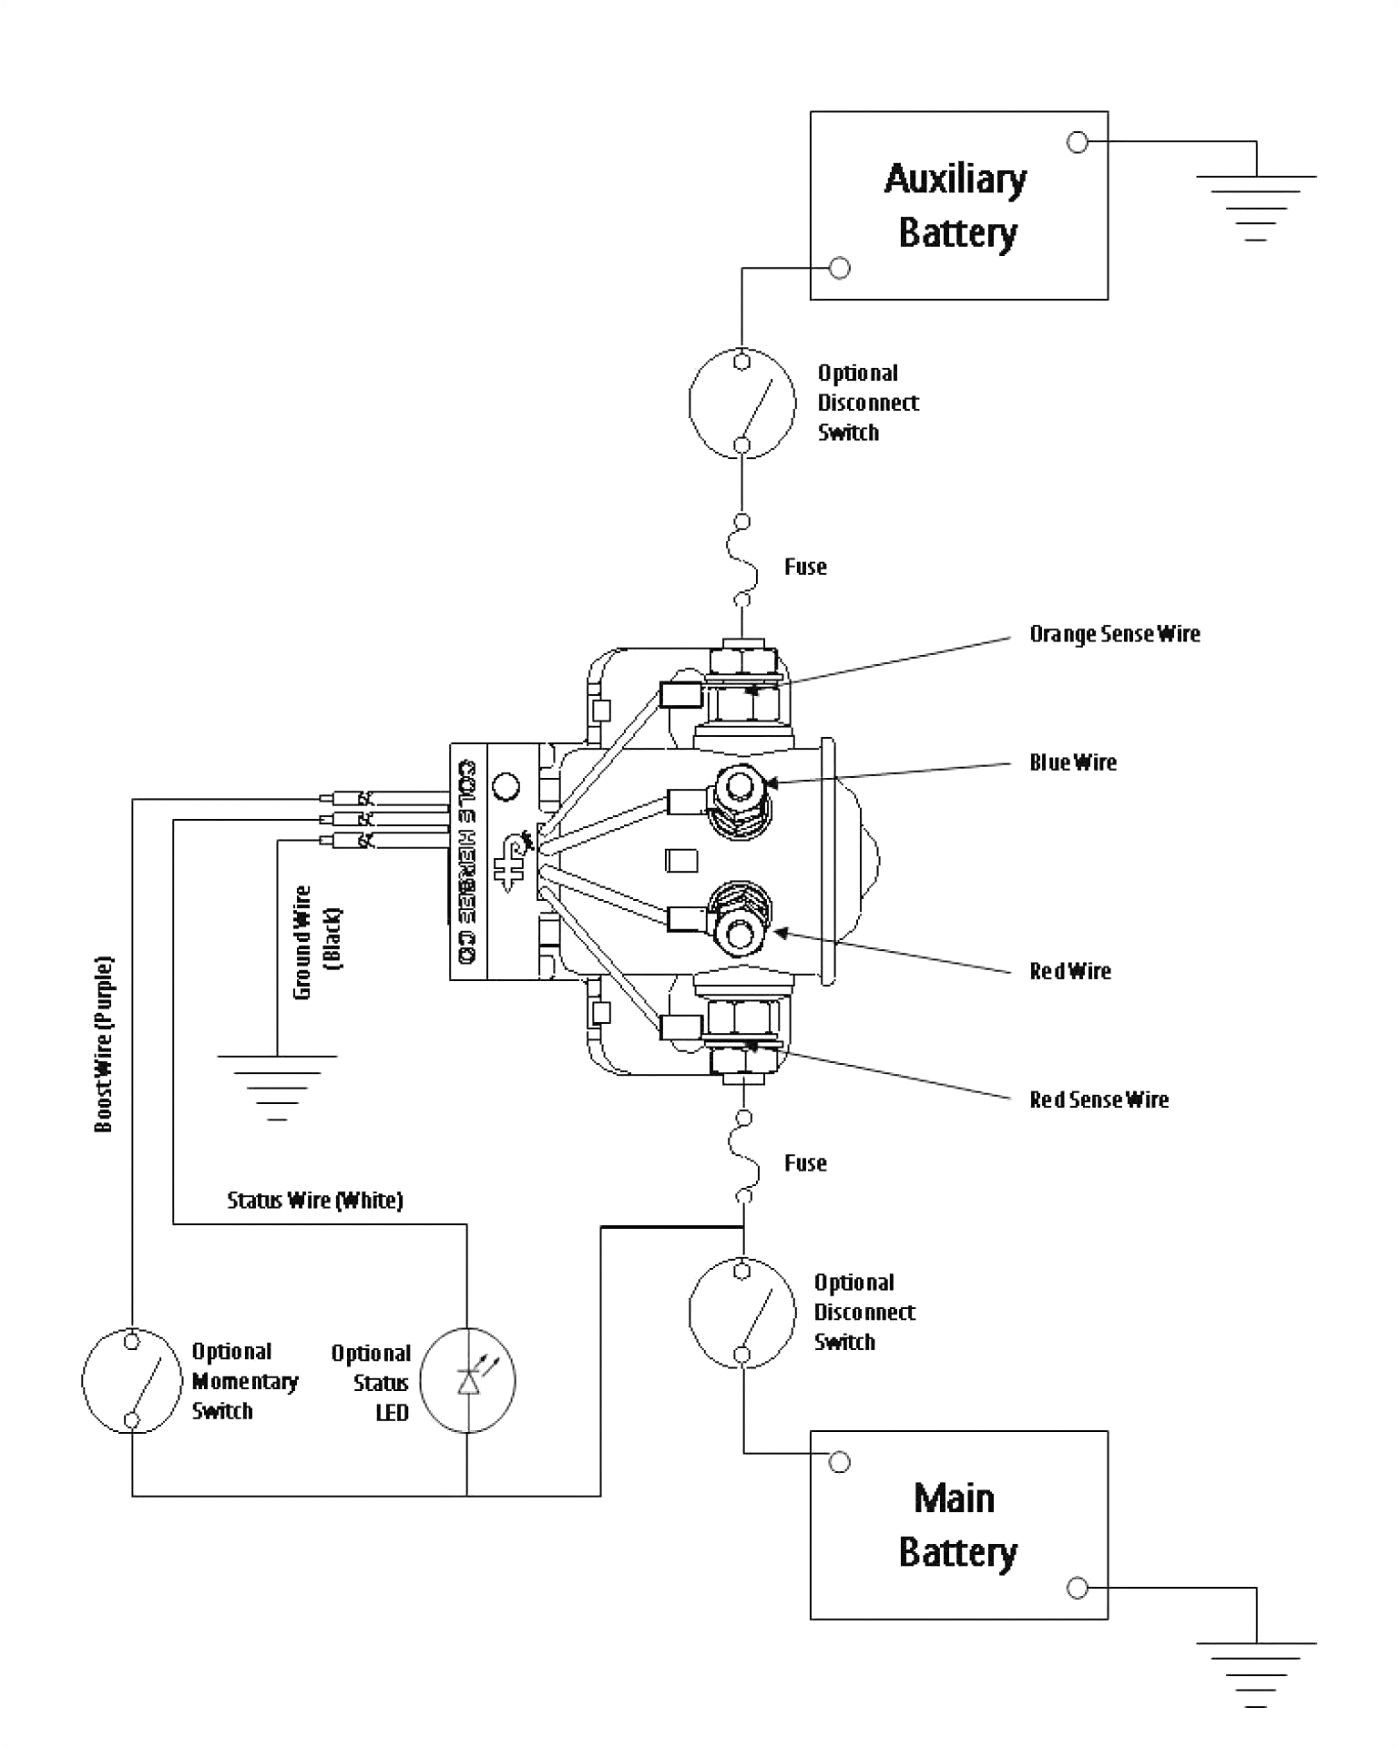 Western Unimount Plow Lights Wiring Diagram